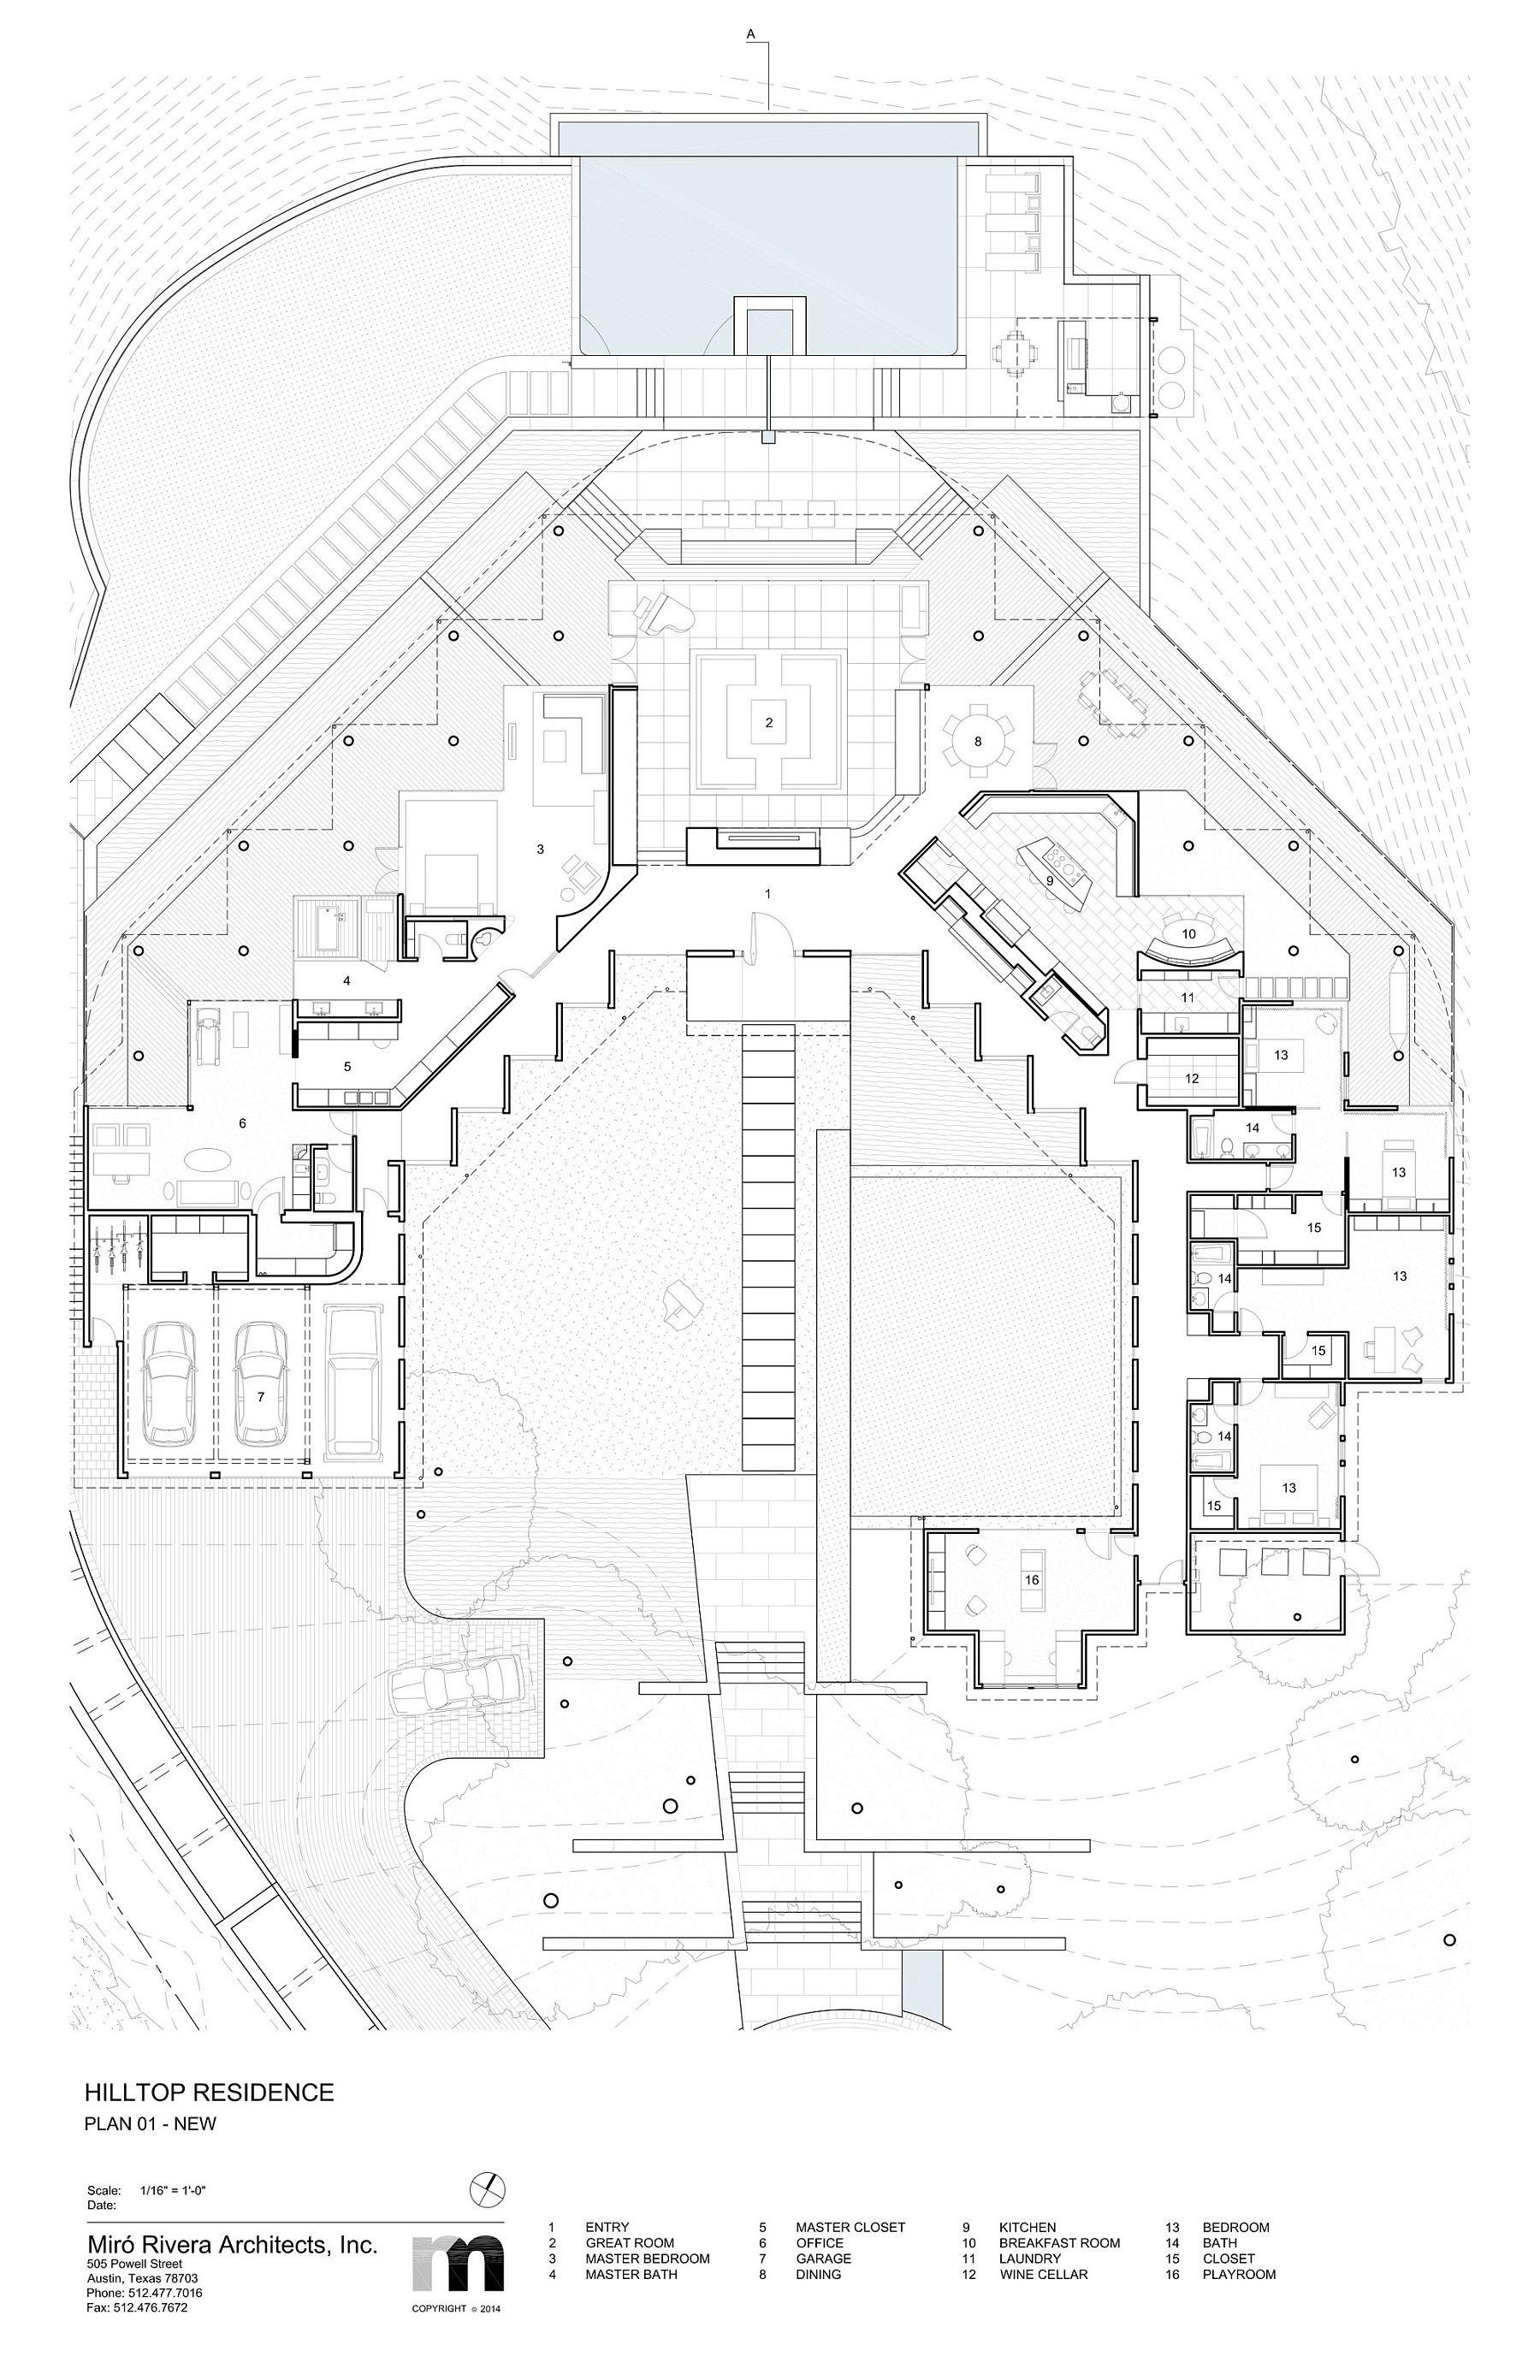 Floor plan of Hilltop Residence after renovation